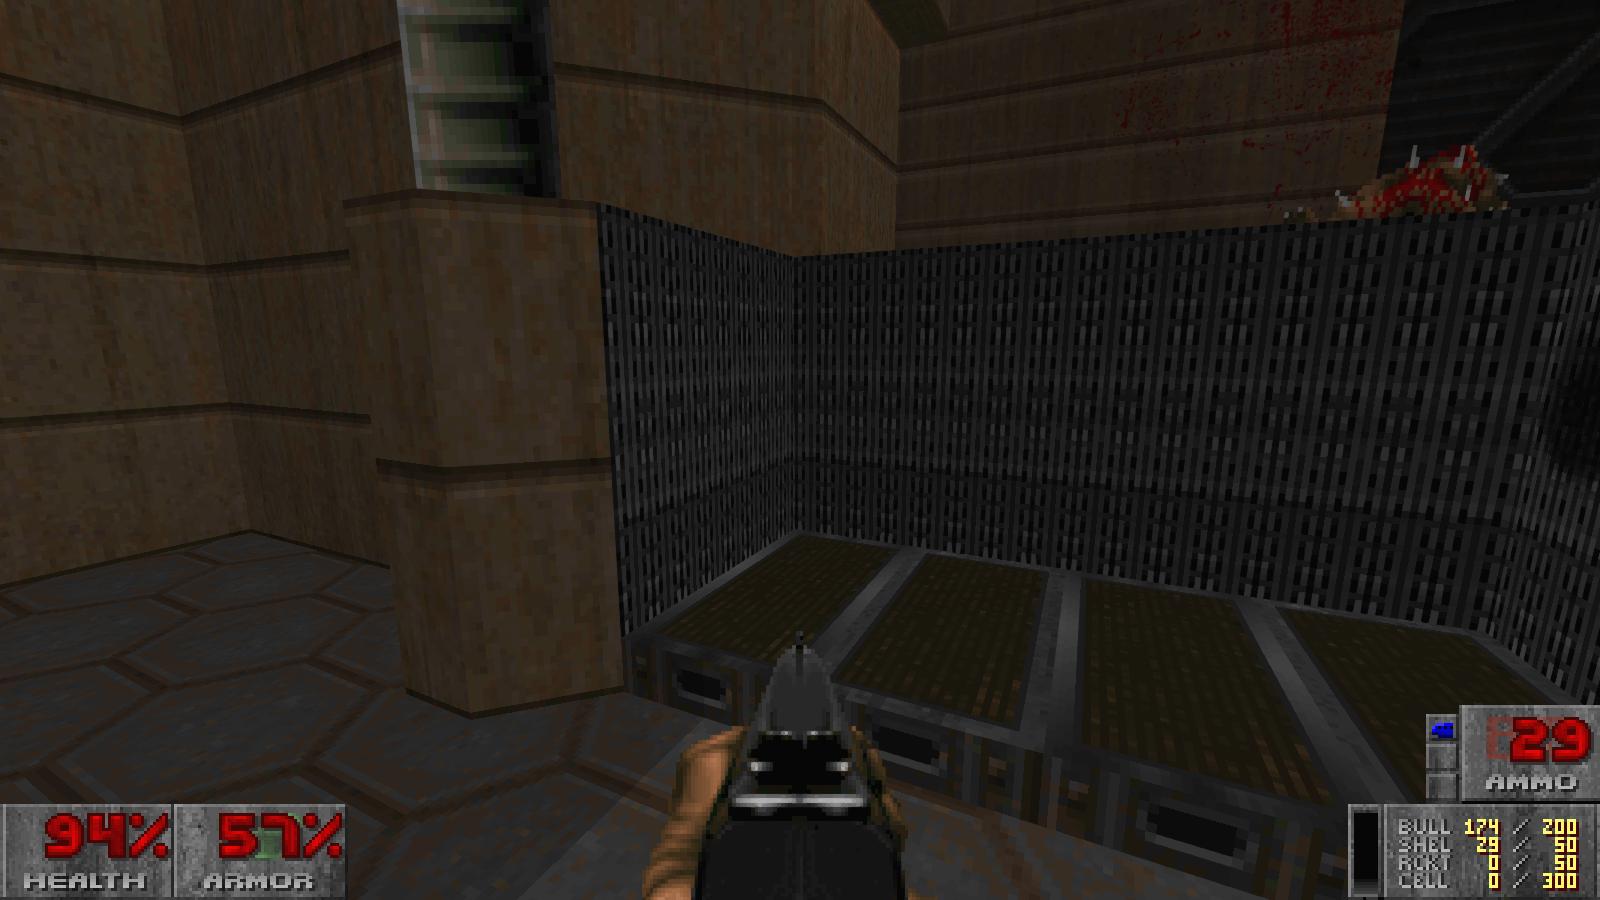 Screenshot_Doom_20210215_124805.png.93137f4eff72bcf2e5ef374e251fc4db.png